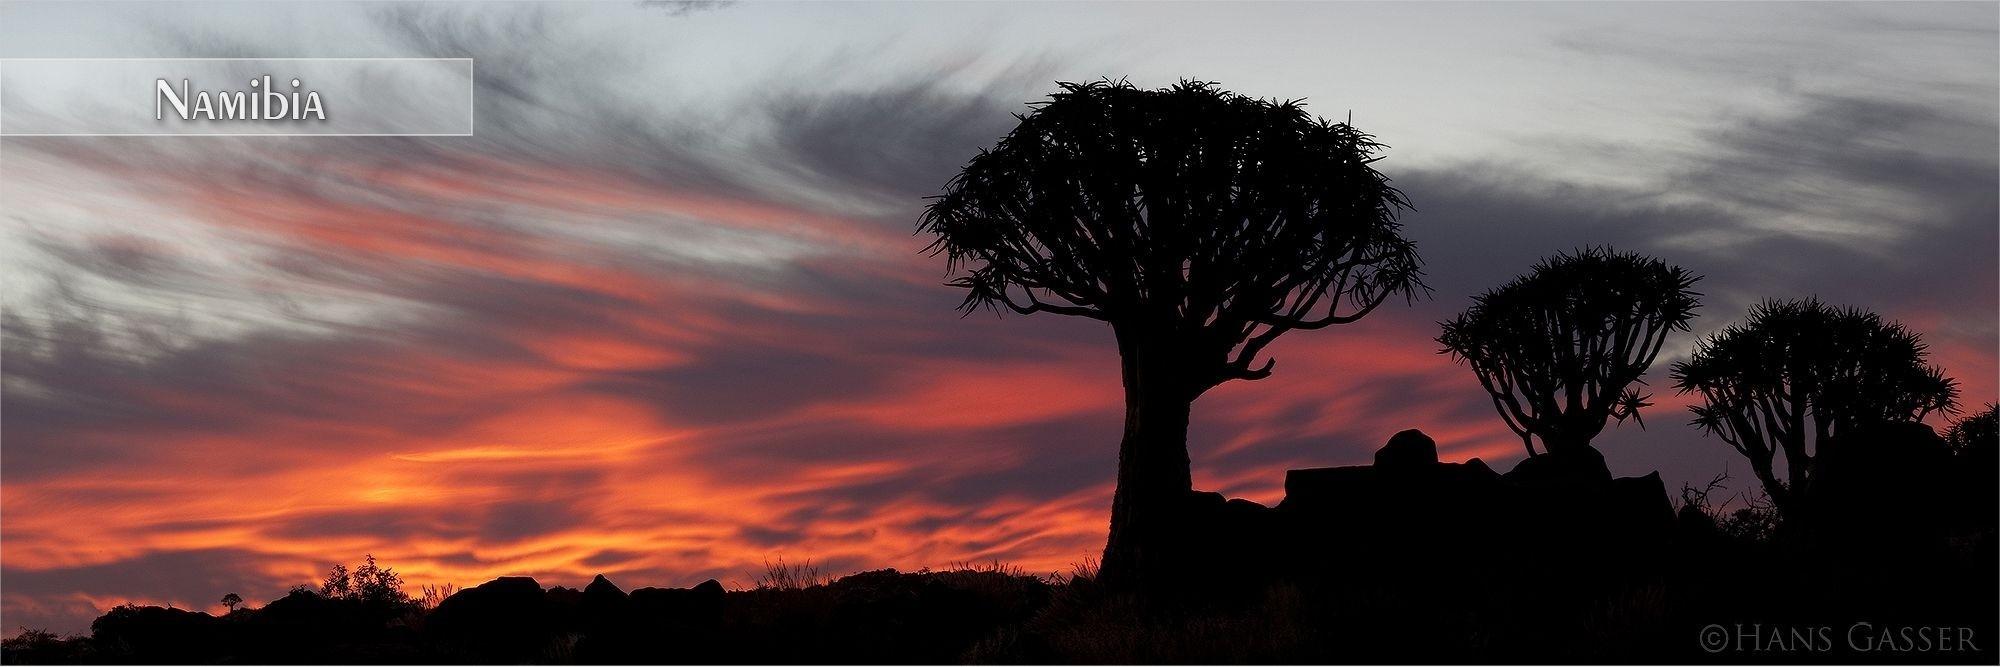 Bilder als Wandbild oder Küchenrückwand aus Namibia